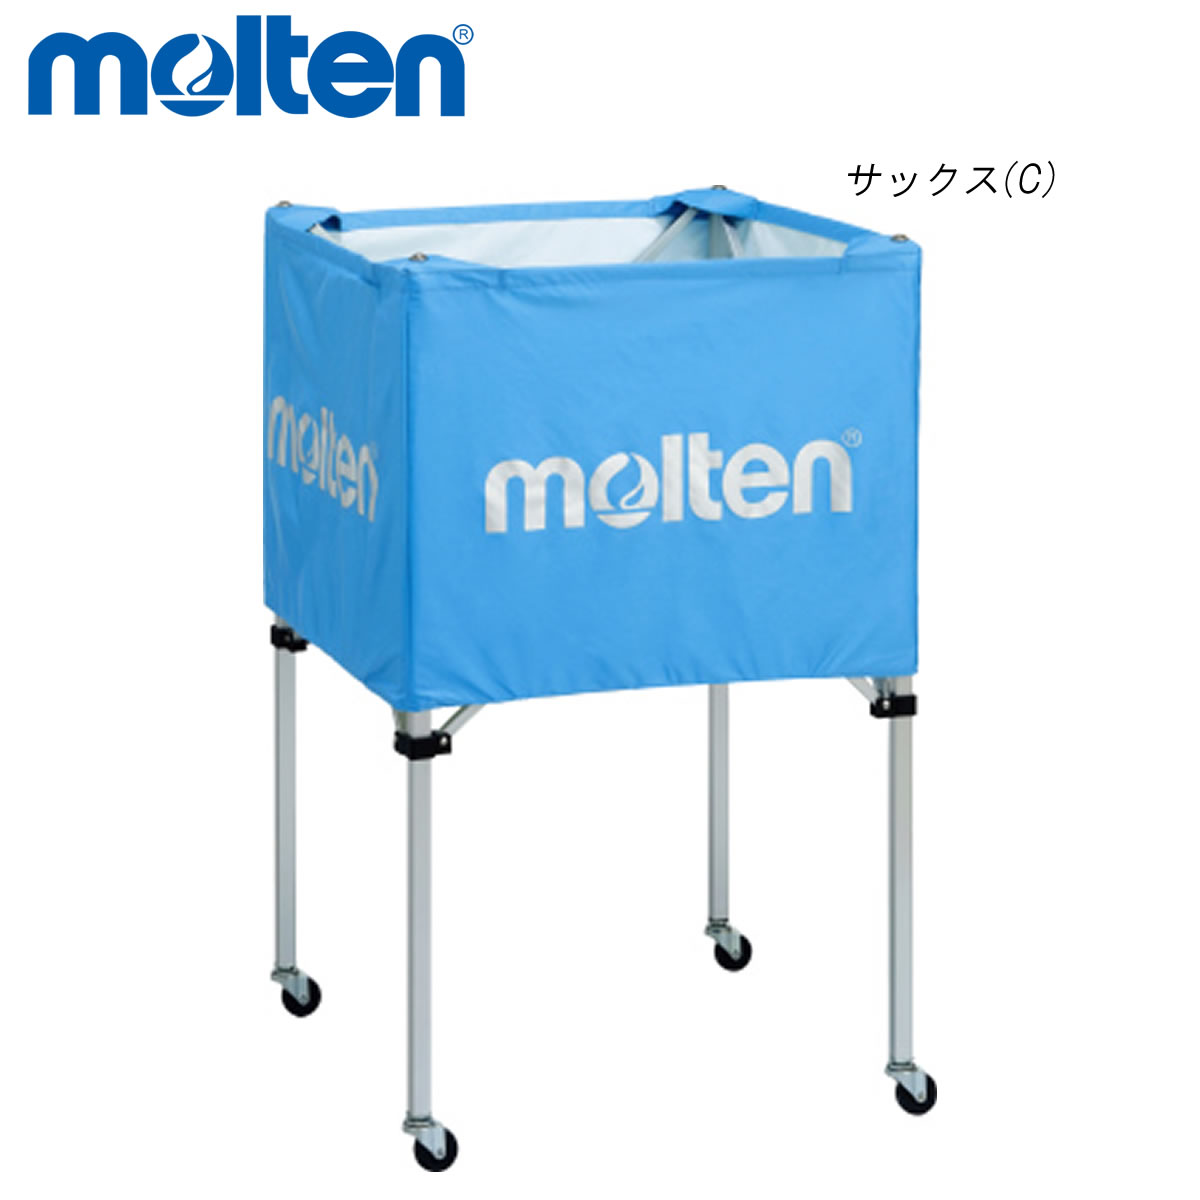 molten BK0023-C ボールカゴ 中・背高 オールスポーツ 設備・備品 モルテン 2021  molten BK0023-C ボールカゴ 中・背高 オールスポーツ 設備・備品 モルテン 2021 【取り寄せ】